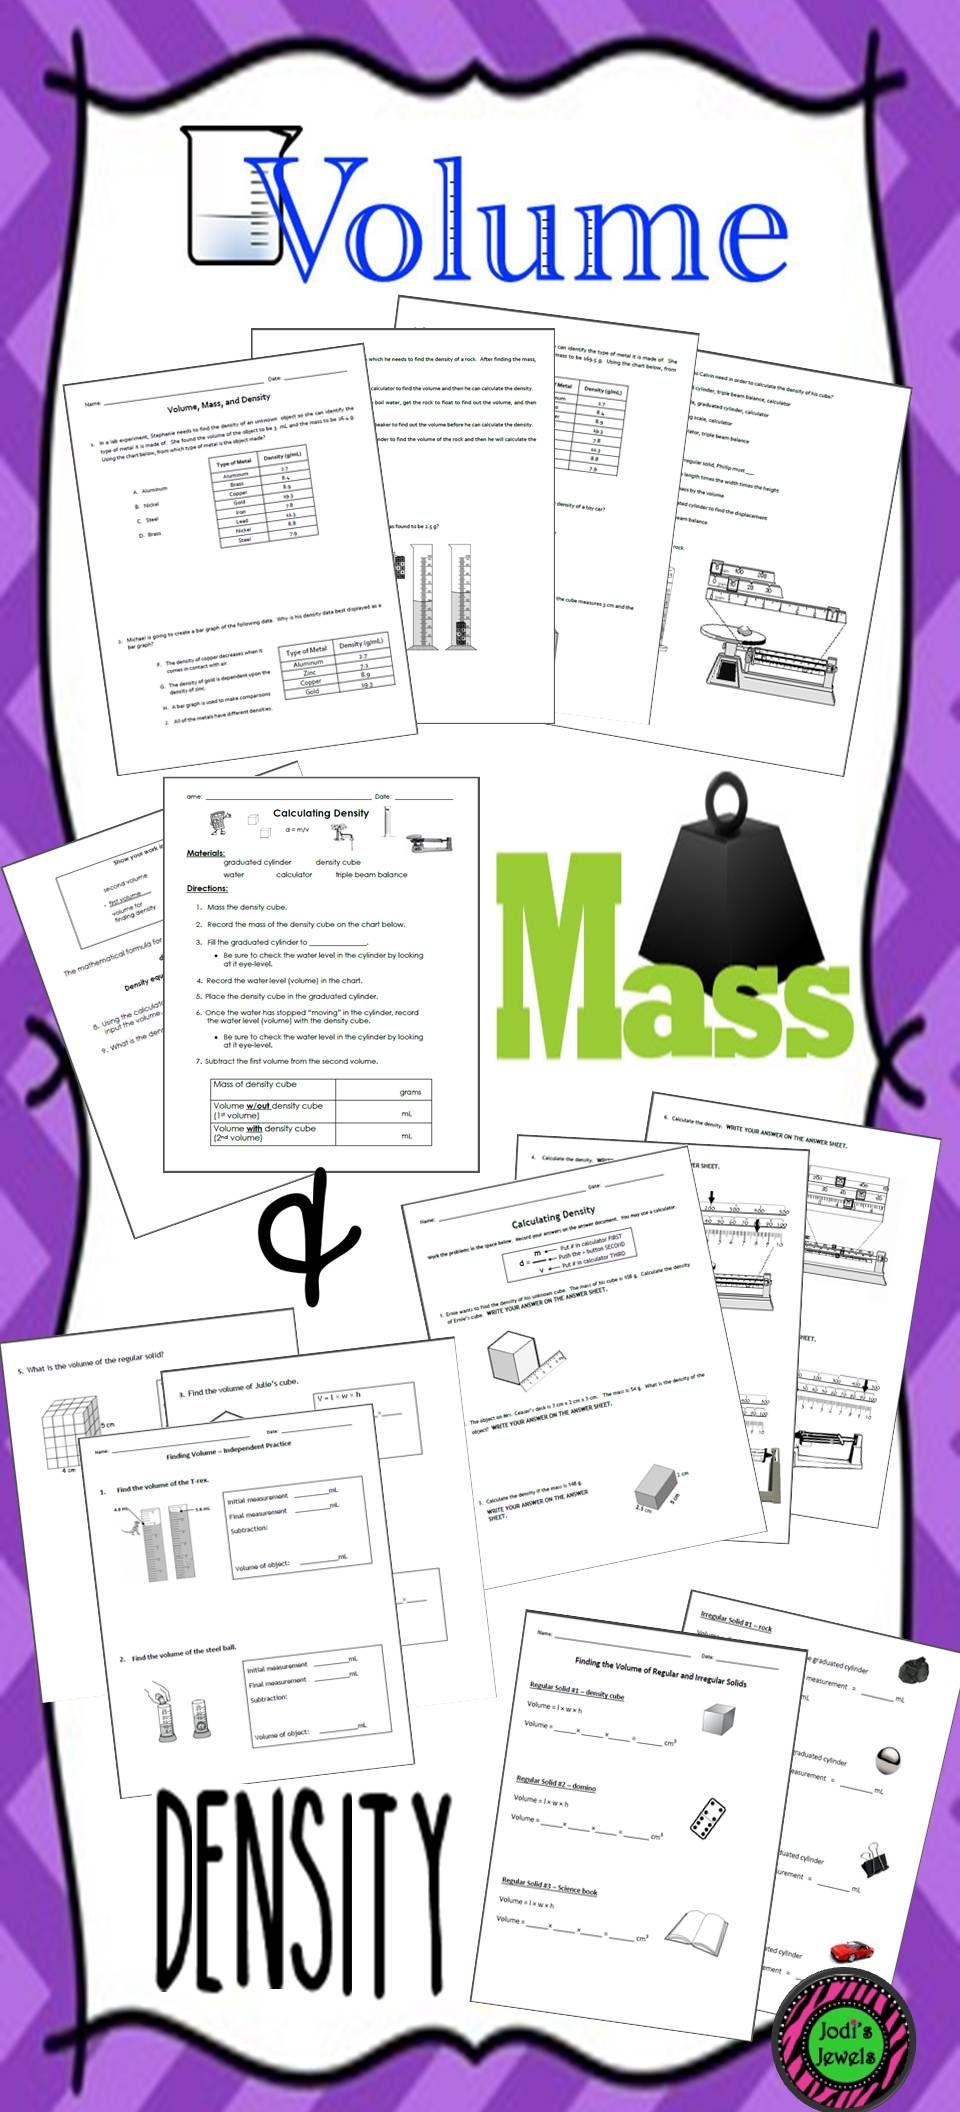 Density Worksheet Middle School Volume Mass & Density Lab Sheets and Worksheet Practice